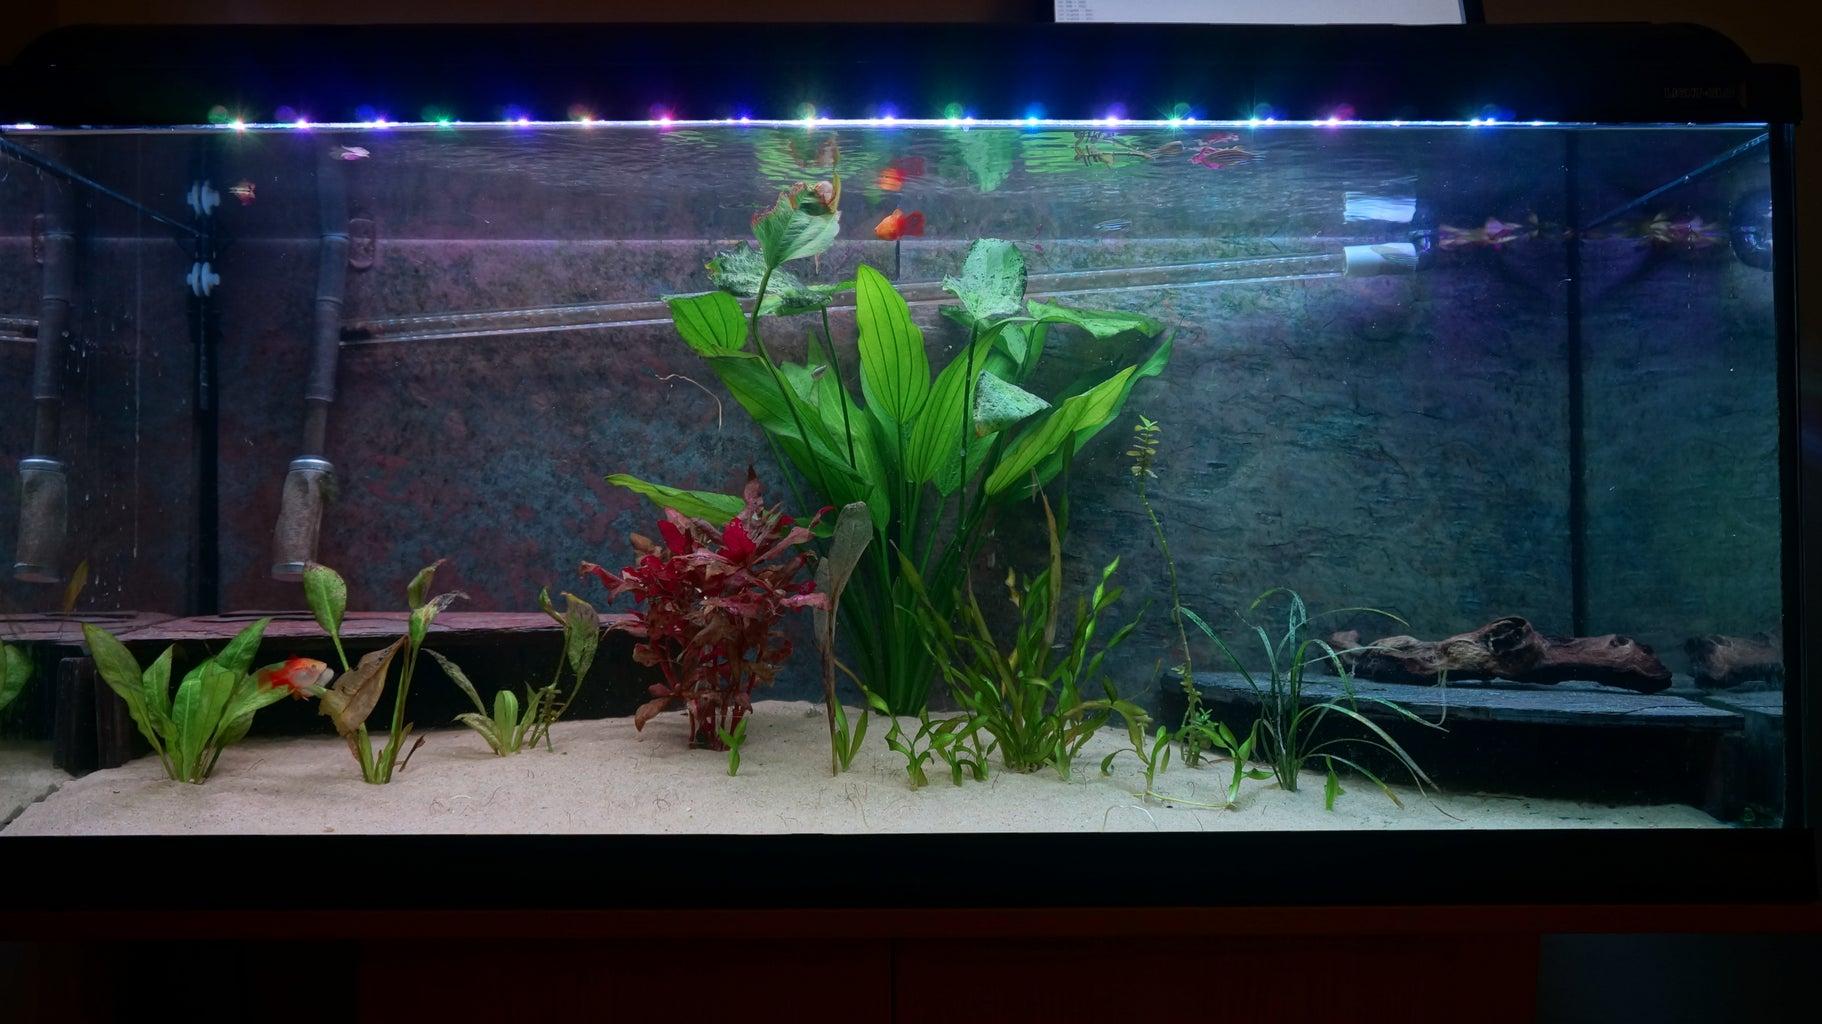 RGB Aquarium Lights With Sunsets and Sunrises